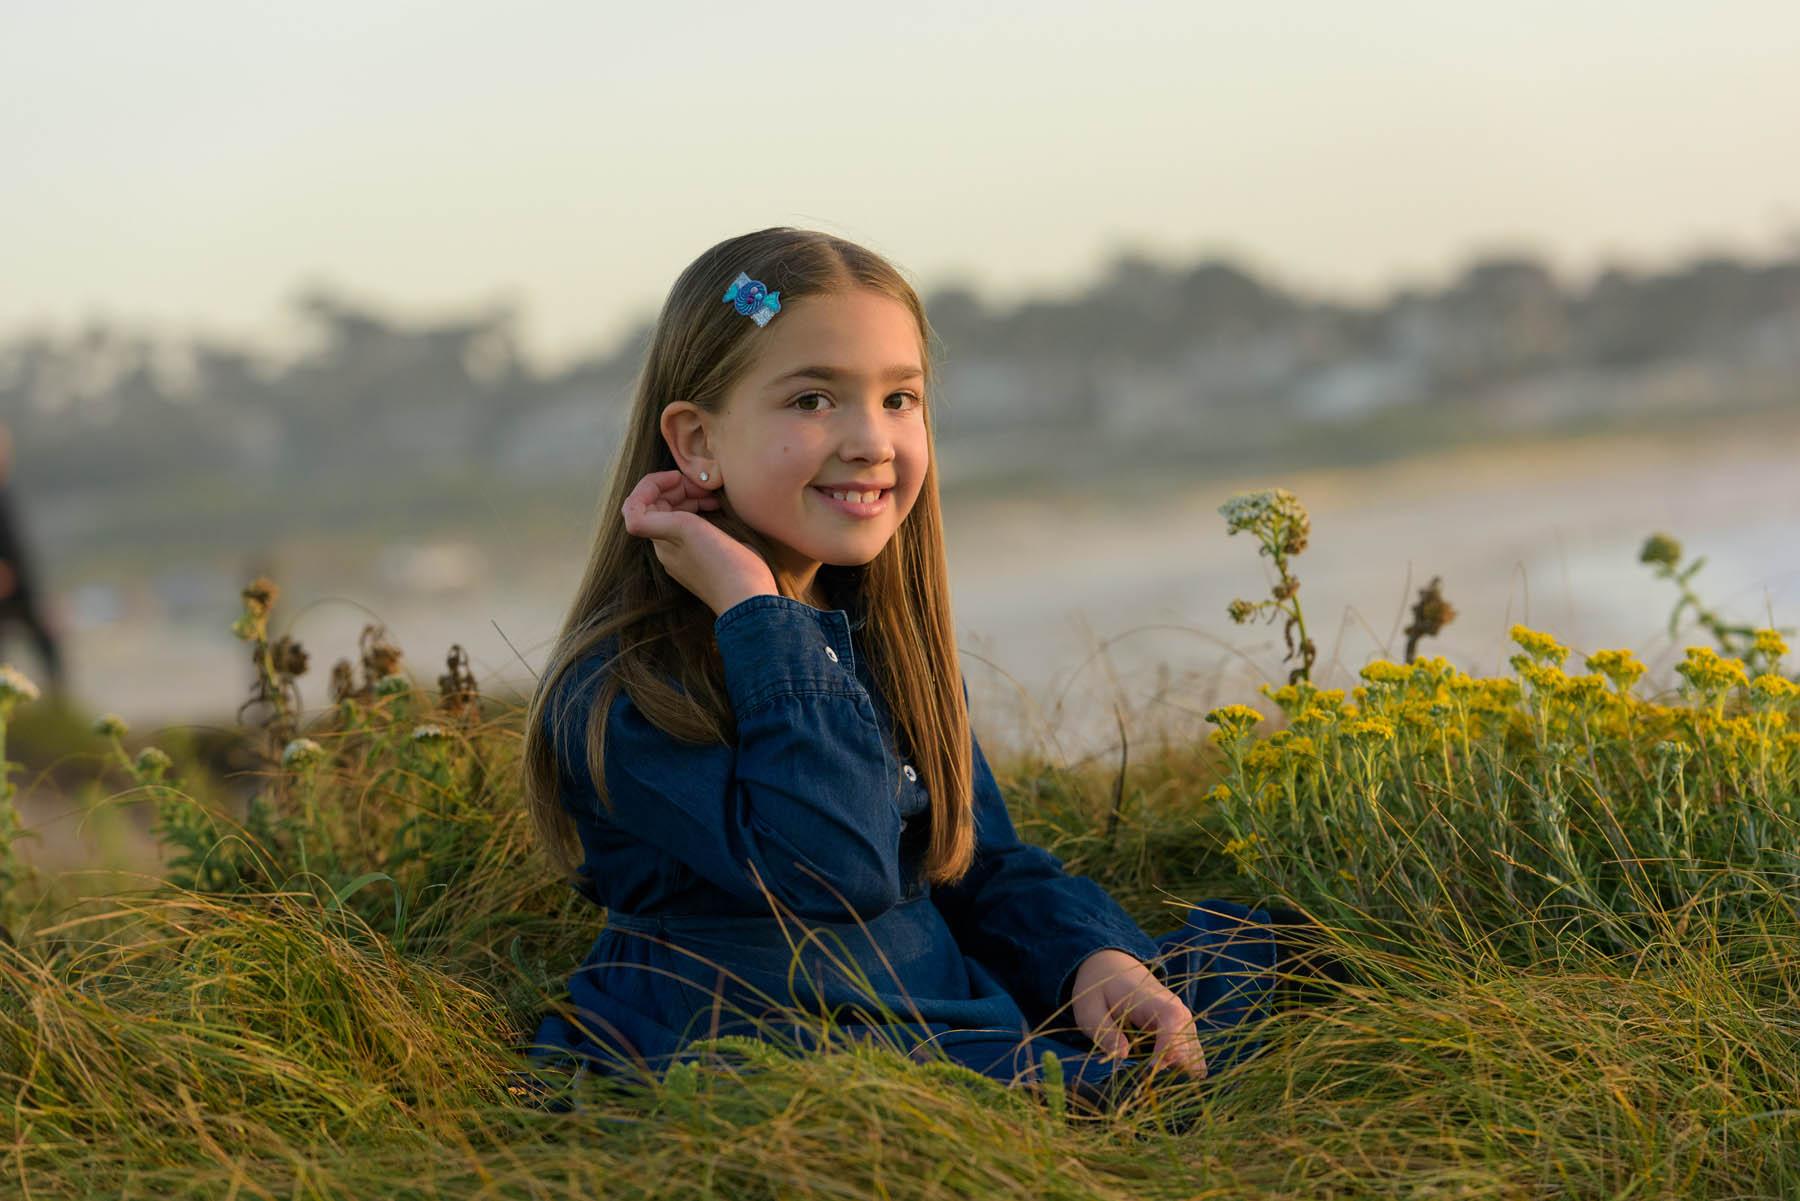 1746_Ben_Nicole_Pebble_Beach_Family_Portrait_Photography.jpg